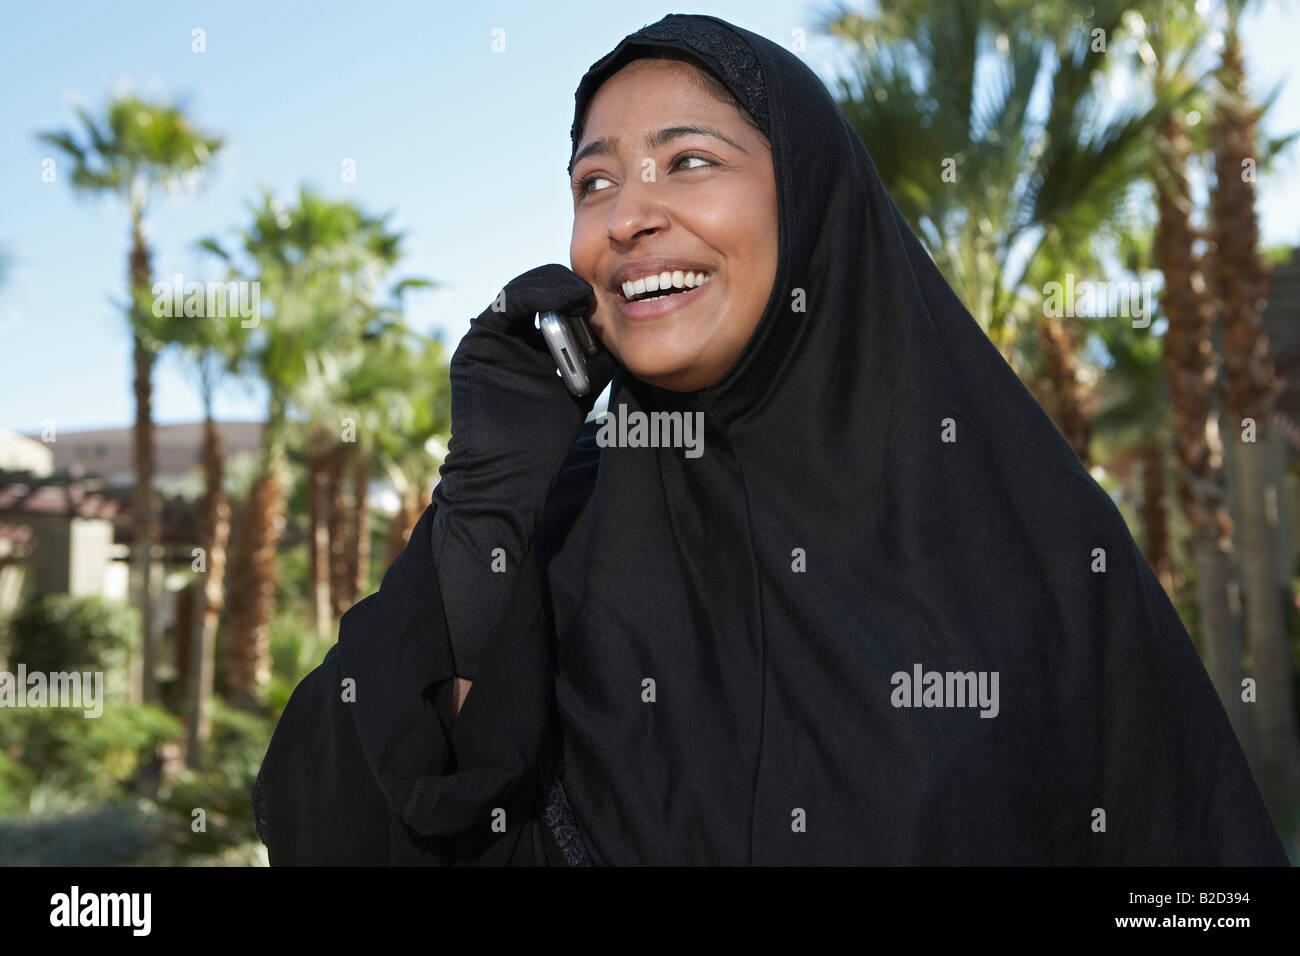 mobile single muslim girls Bangladesh married women mobile number for fun dating  bangladesh mobile, muslim friendship, find love dating, fun dating , chat, divorce social network .